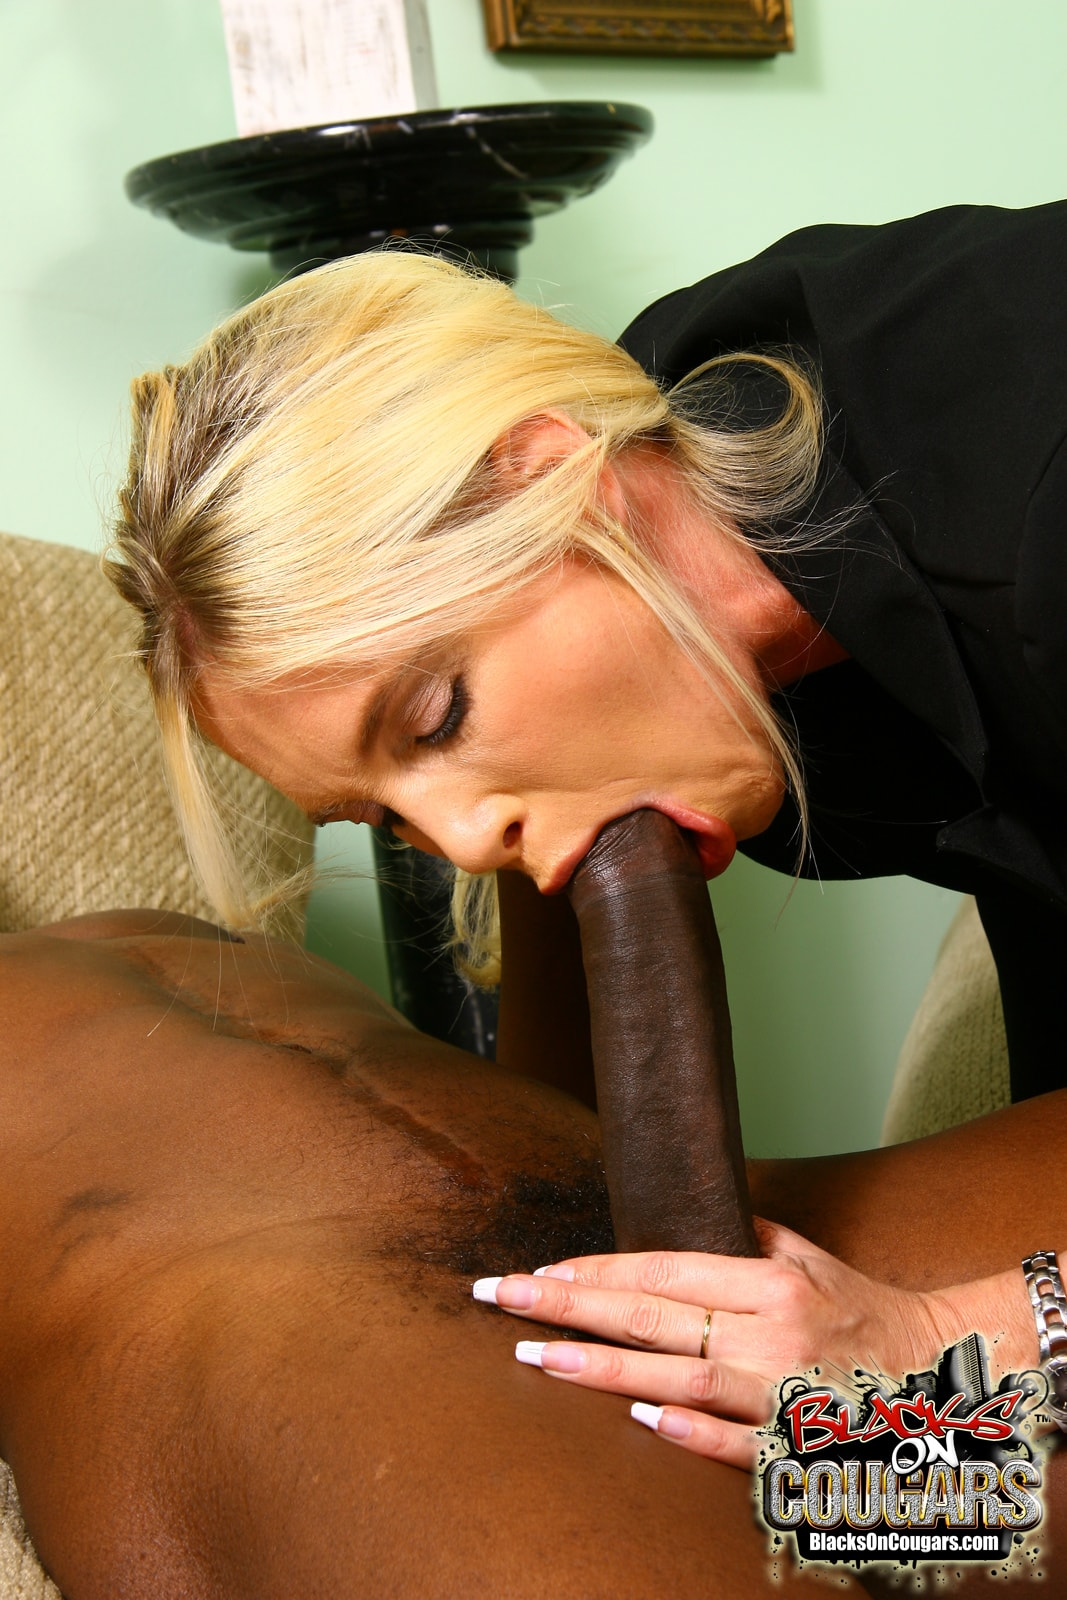 Dogfart '- Blacks On Cougars' starring Debbie Dial (Photo 13)